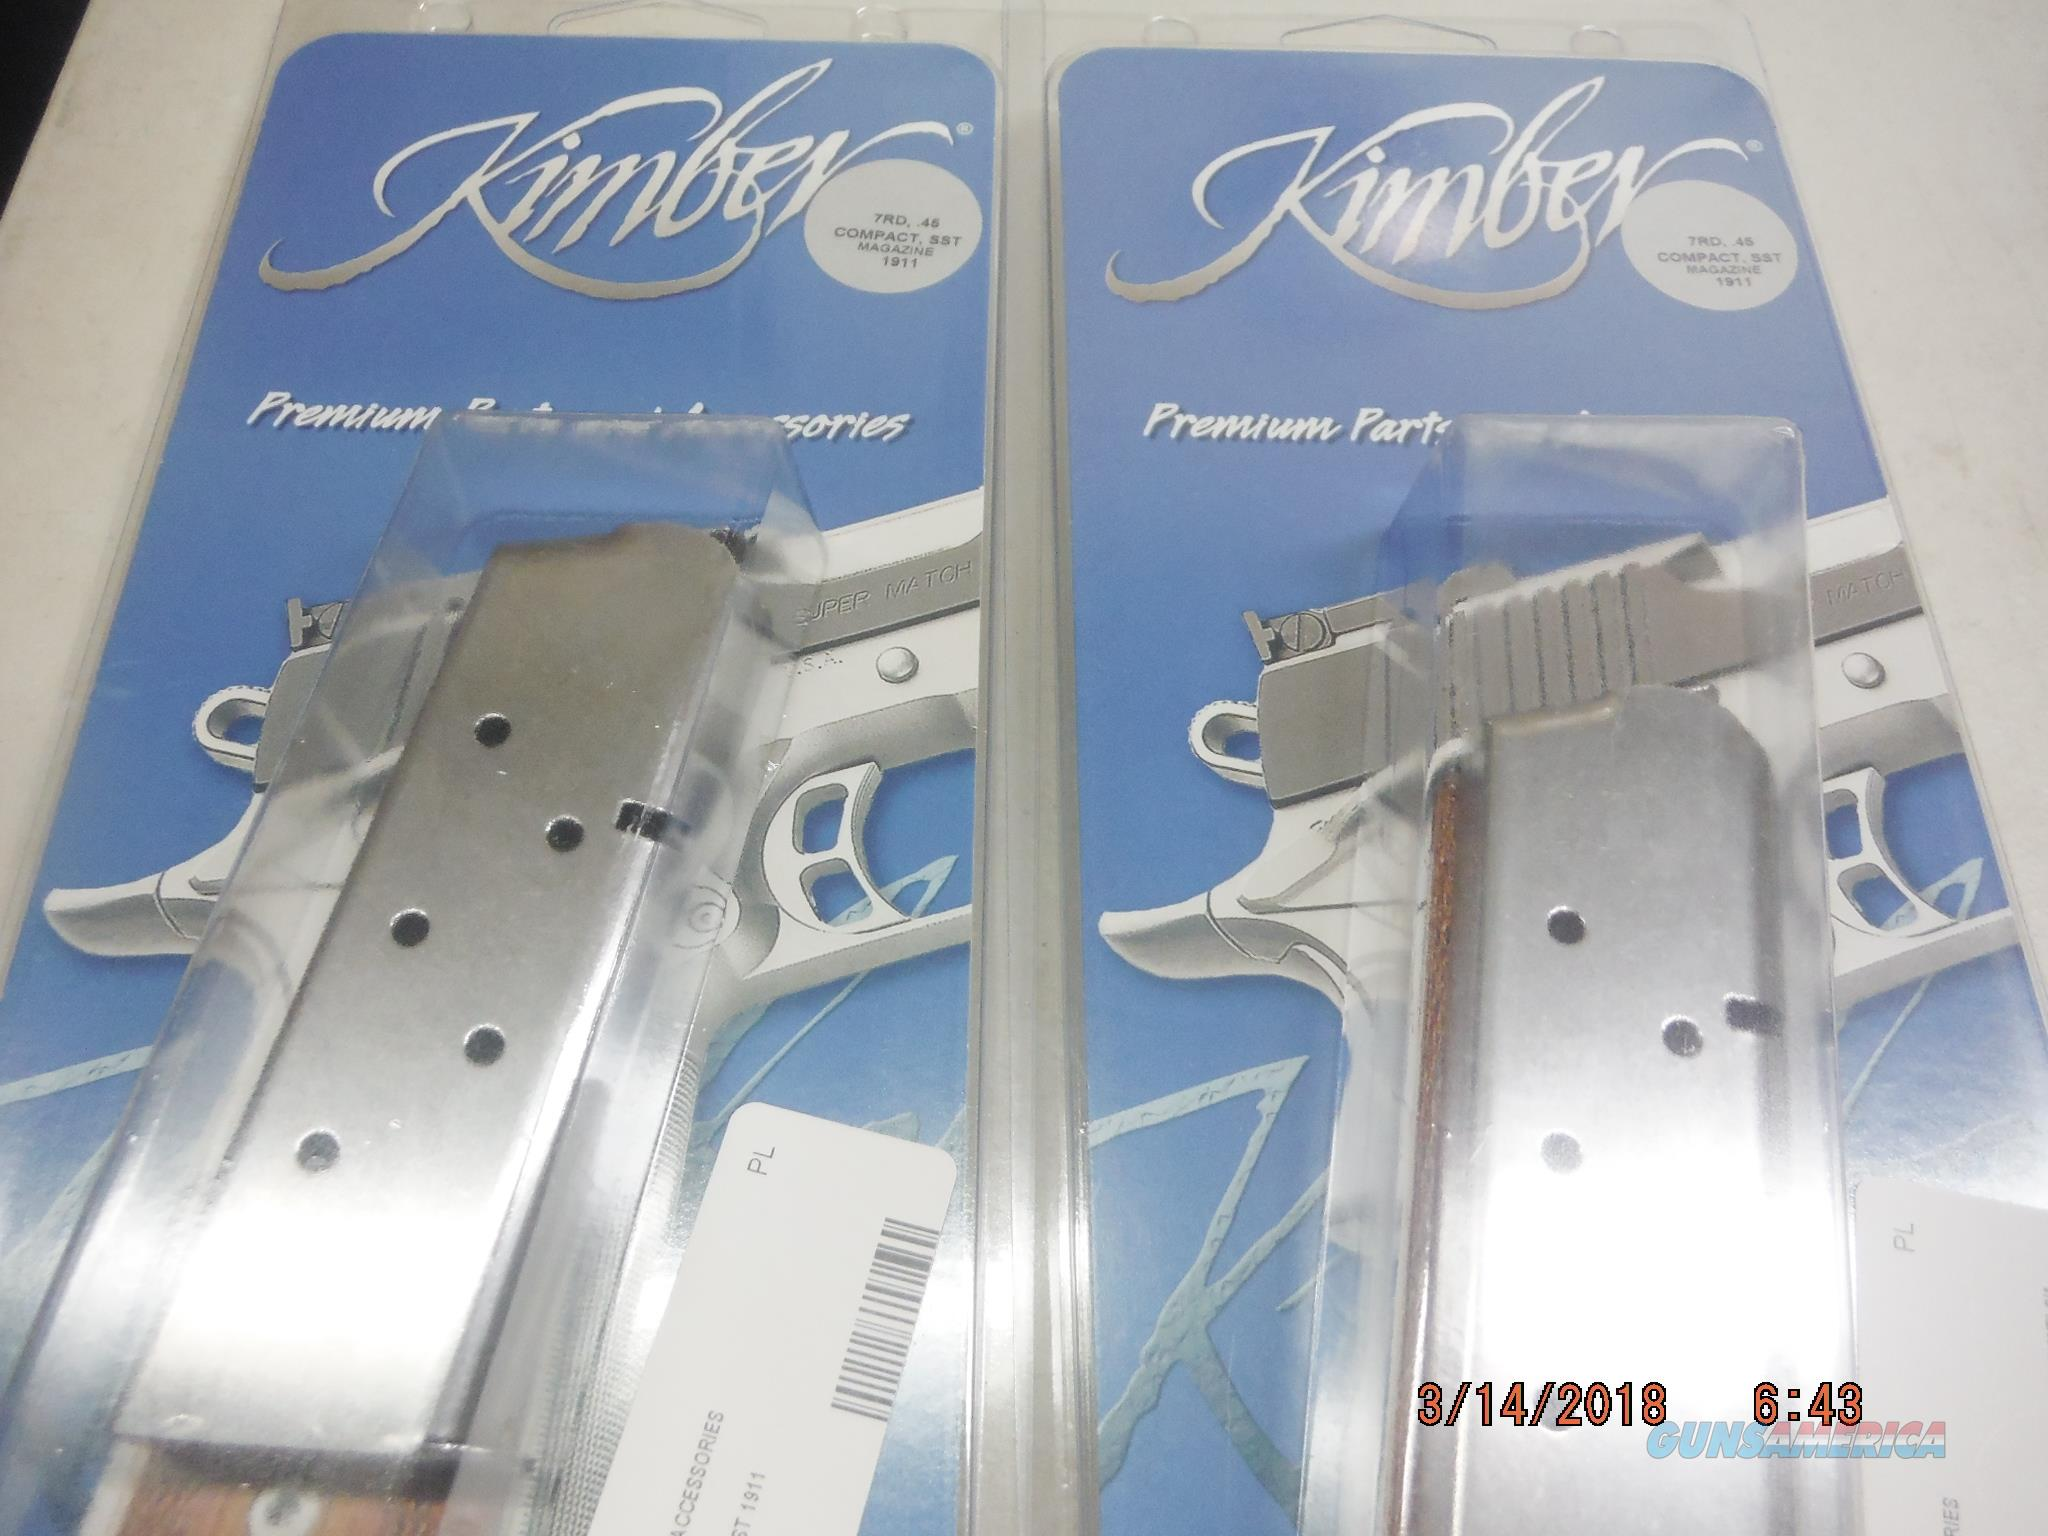 2 KIMBER 1911 Compact Mag 45 ACP 7Rd SS Factory Kimber  Non-Guns > Magazines & Clips > Pistol Magazines > 1911